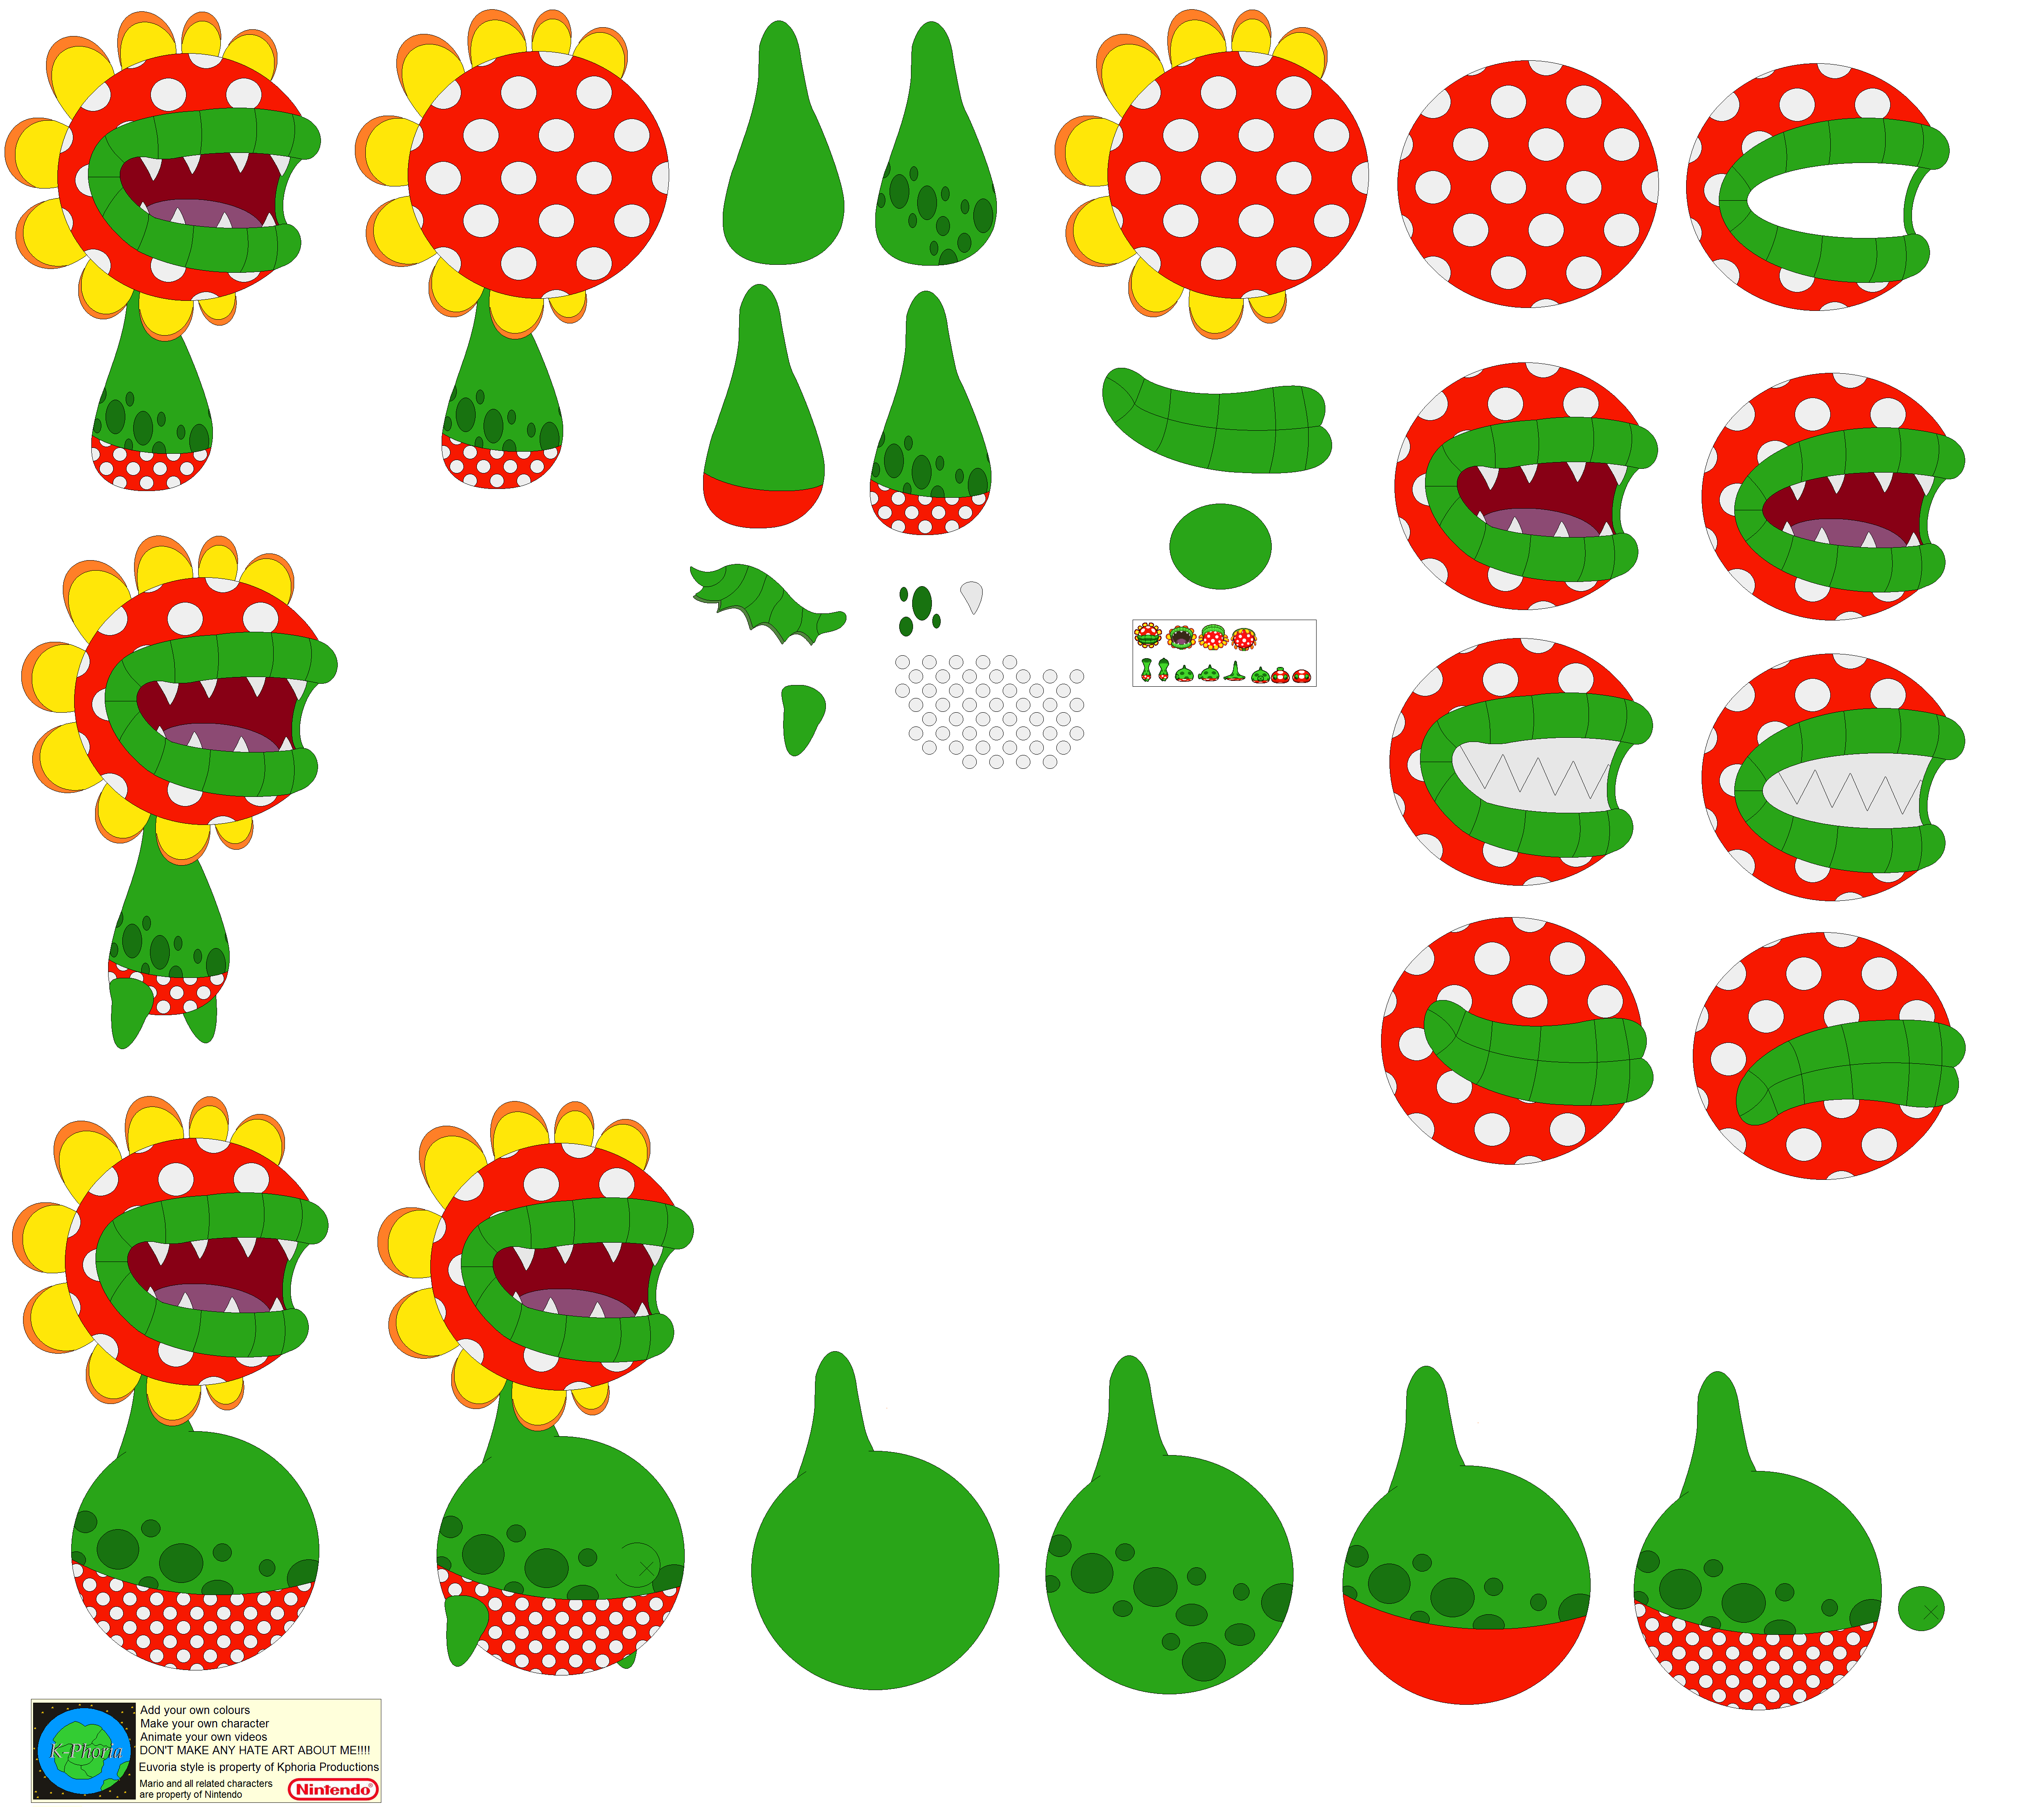 Character Builder-Petey Piranha By Kphoria On DeviantArt